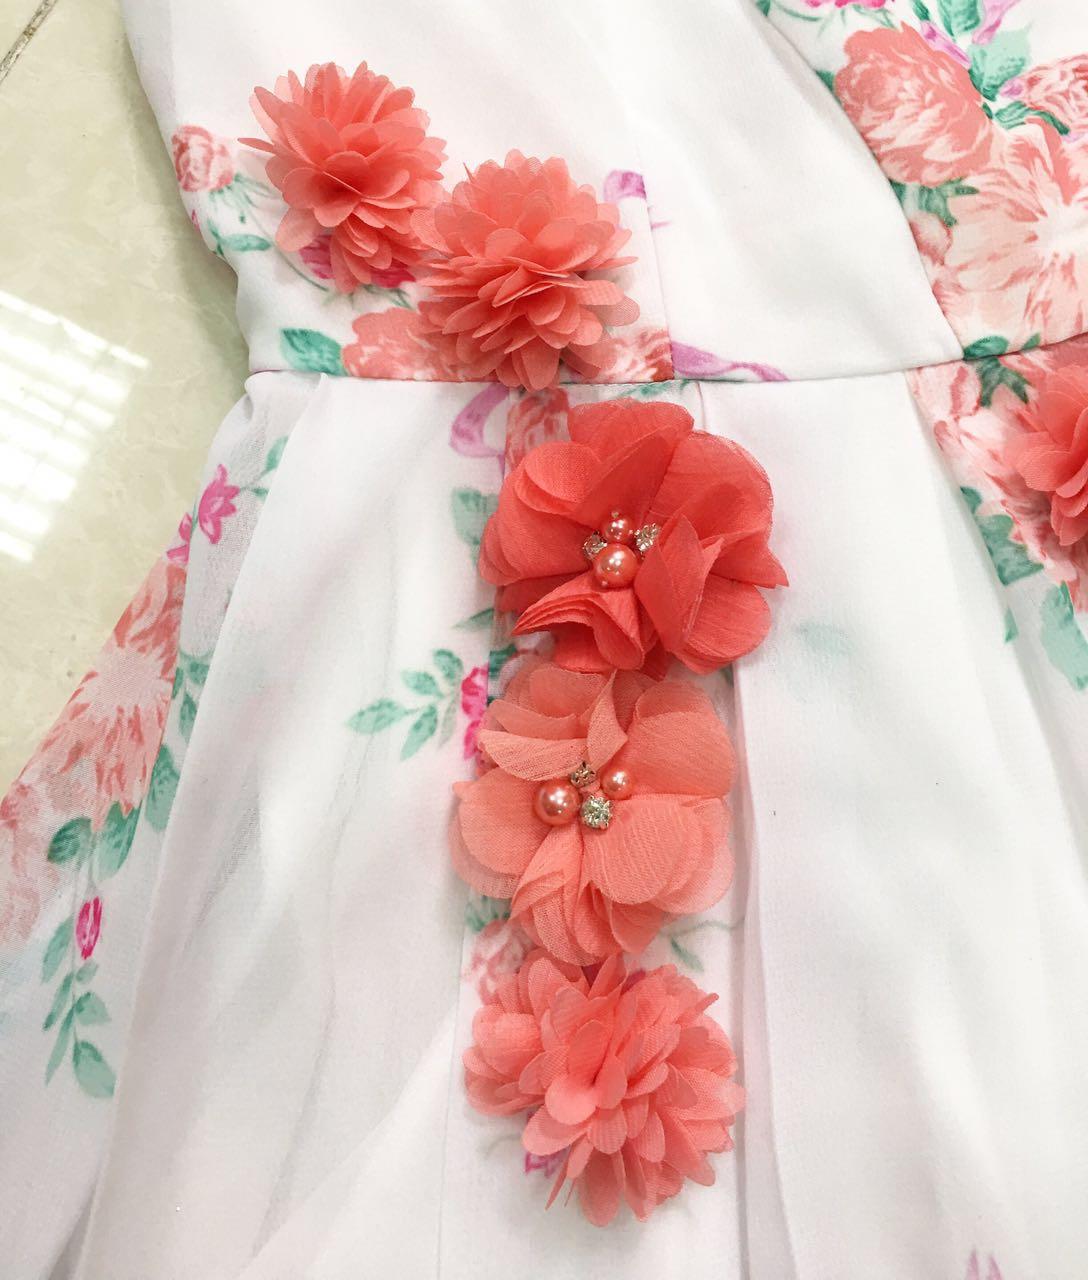 Bm31 Belle 2017 White Dress Celebration Dress Disneybound Chiffon